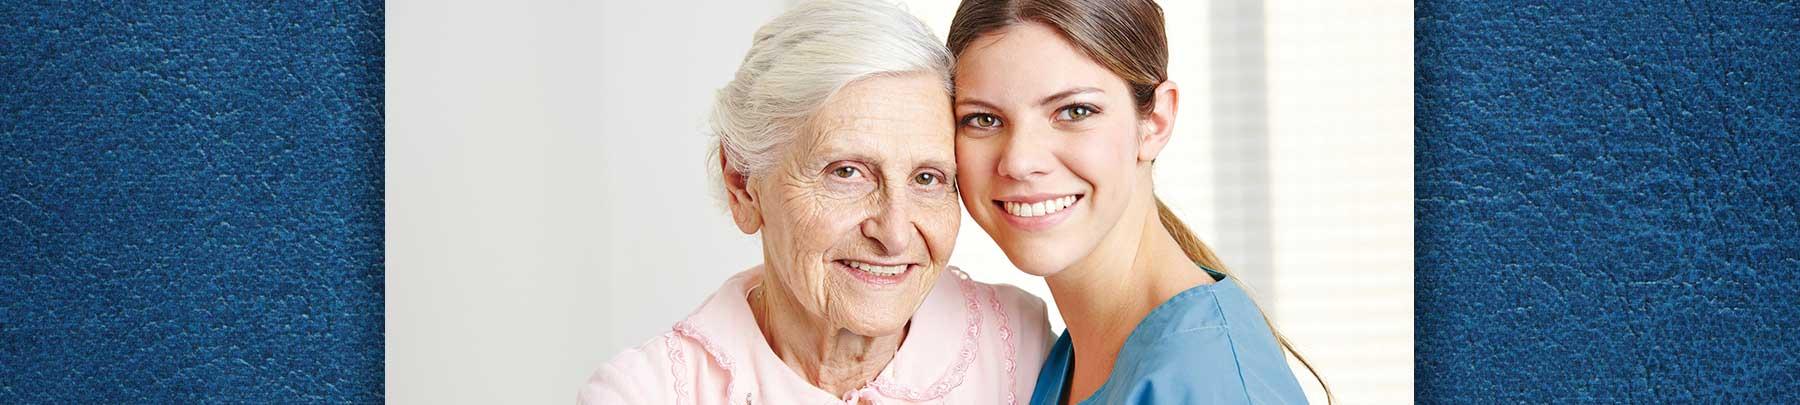 Senior with caregiver smiling at camera